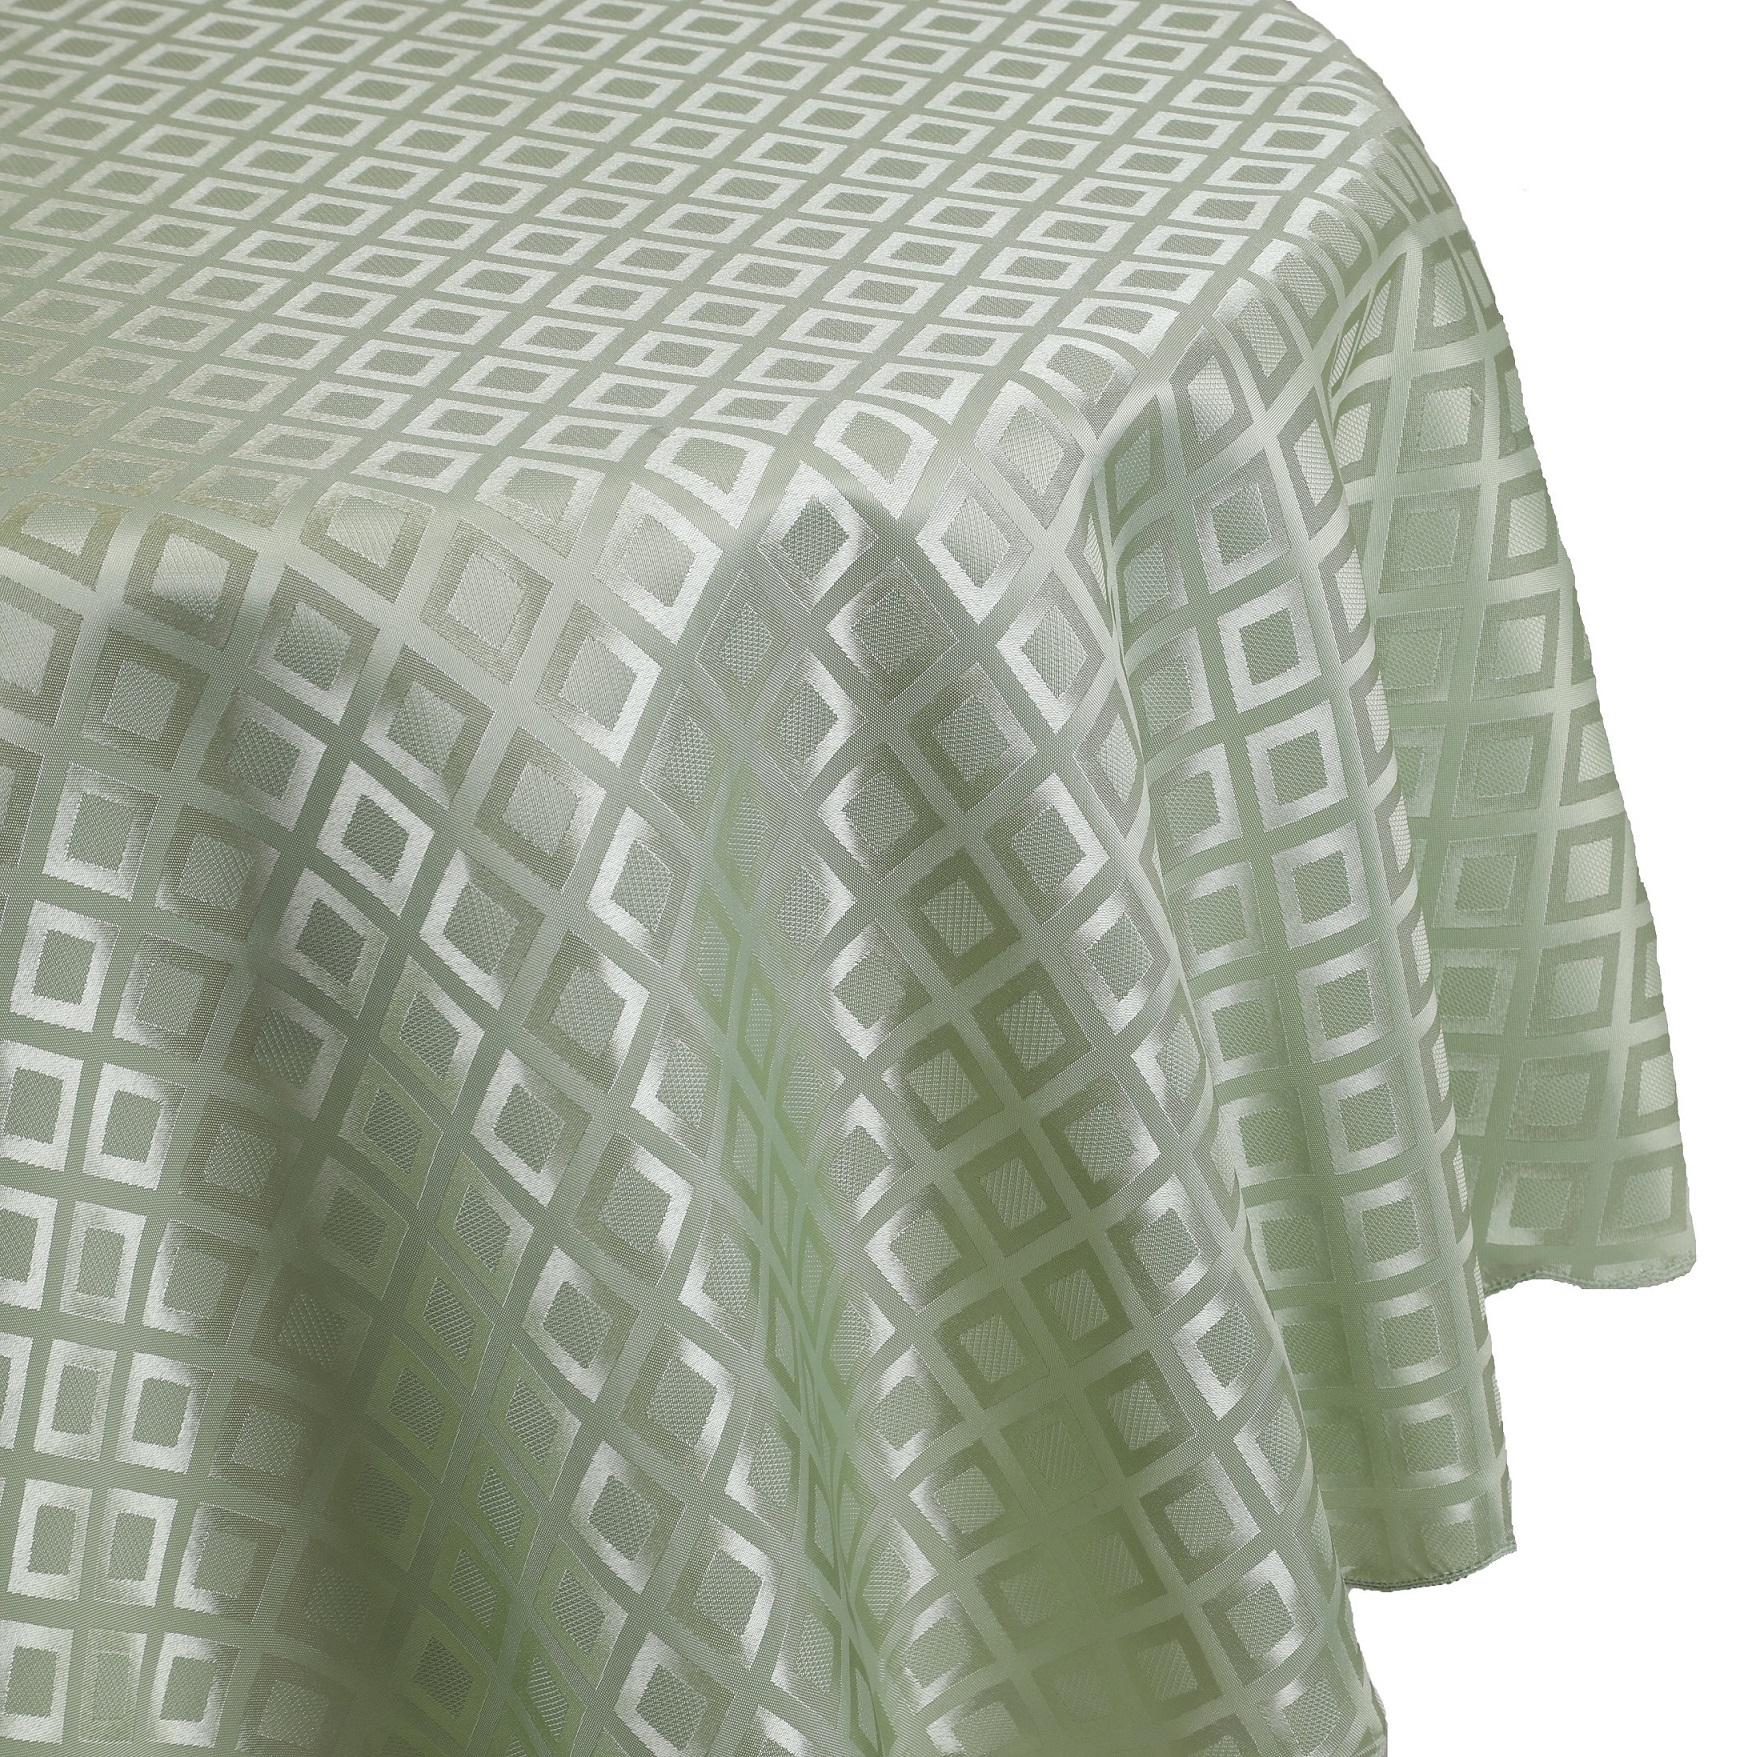 betz nappe jacquard linge de table dessin 8 couleur vert. Black Bedroom Furniture Sets. Home Design Ideas